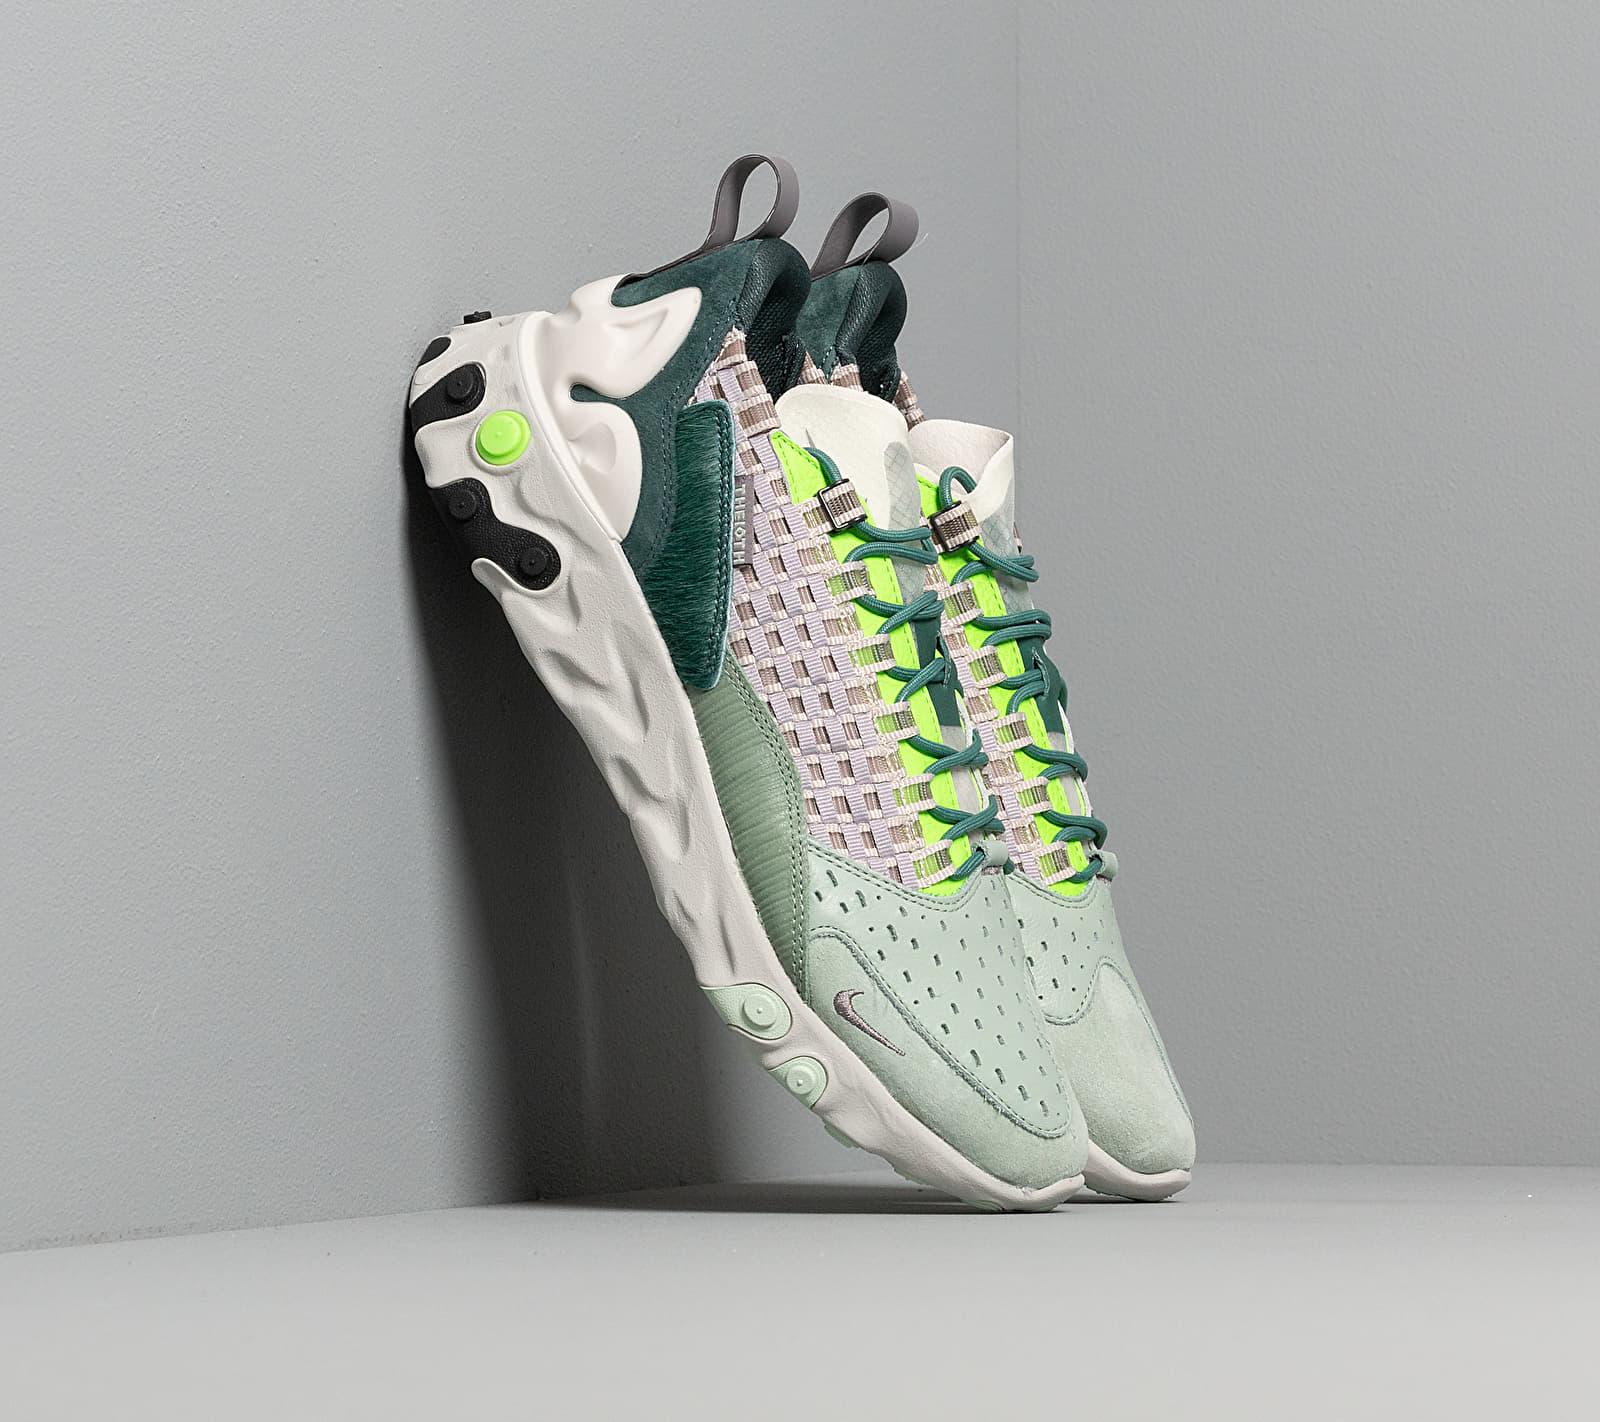 Nike React Sertu Faded Spruce/ Gunsmoke-Bicoastal CT3442-300